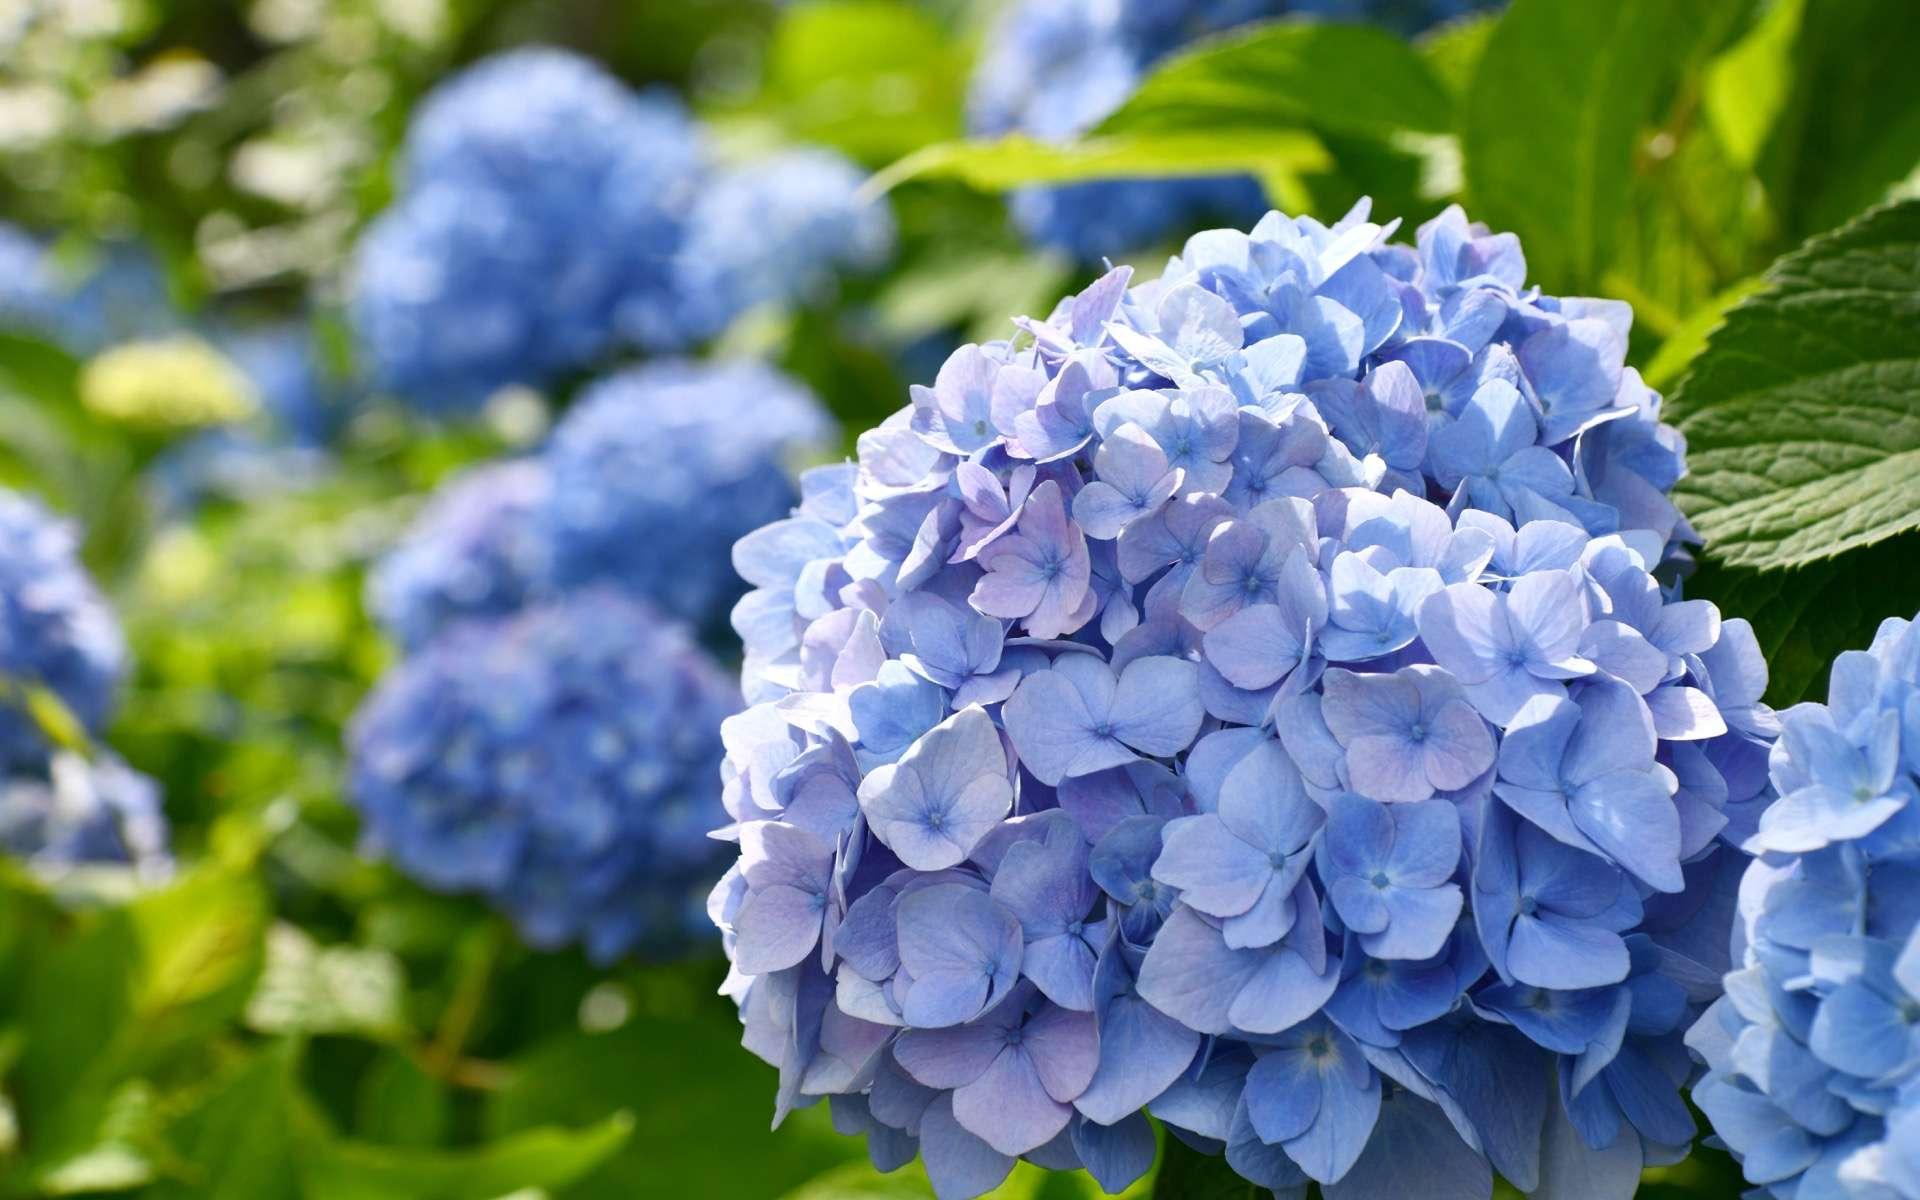 Infloresence bleue d'un hydrangea macrophylla. © Pichchapatr, Adobe Stock